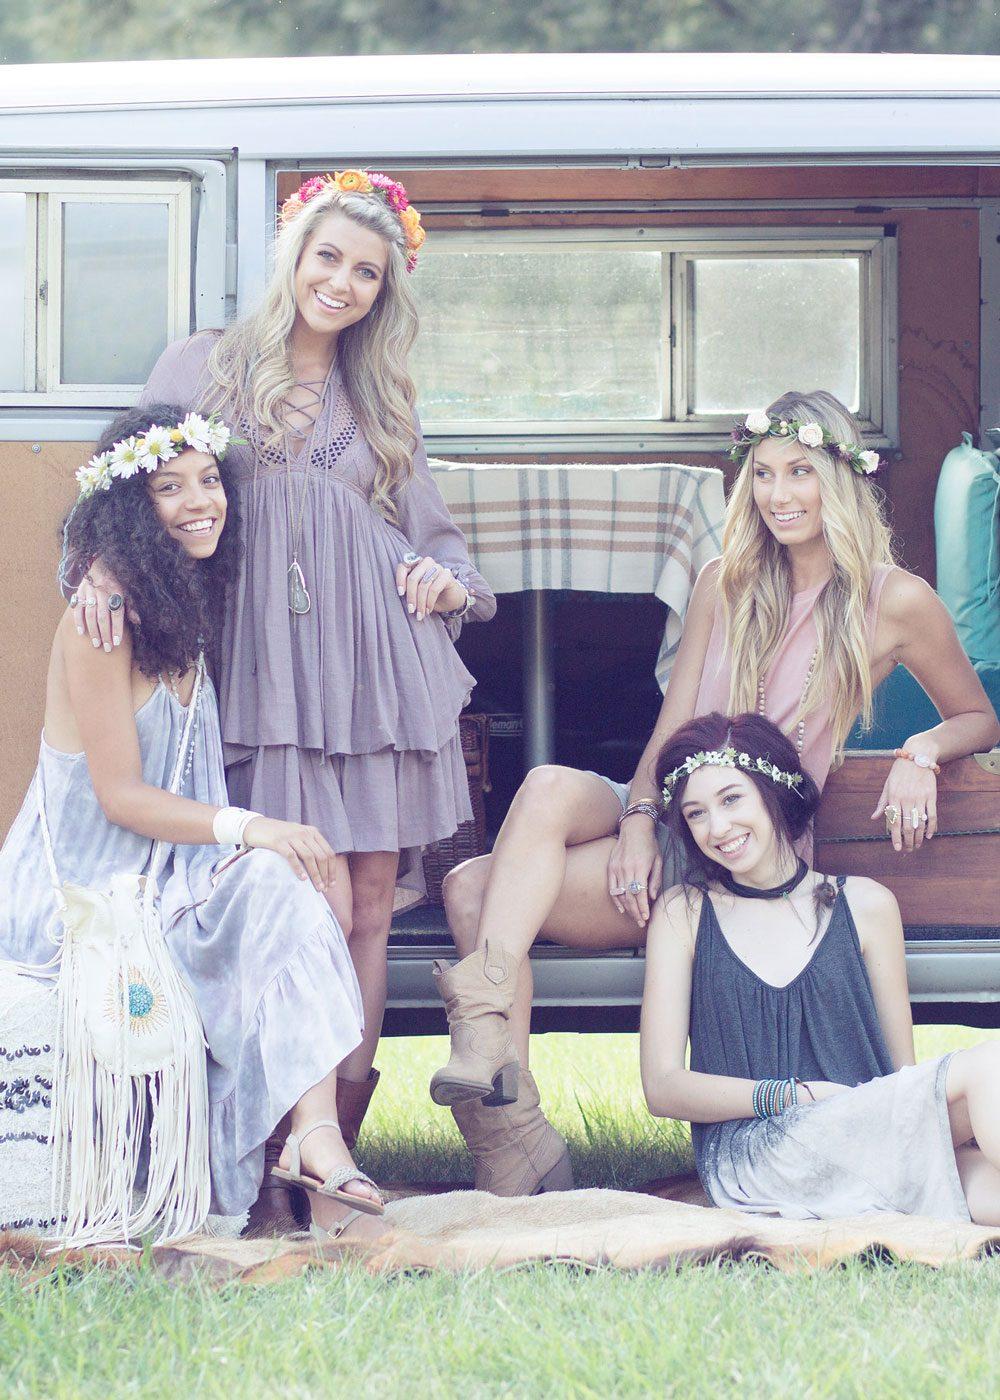 Designer Brands Women S Clothing Traveling Chic Boutique